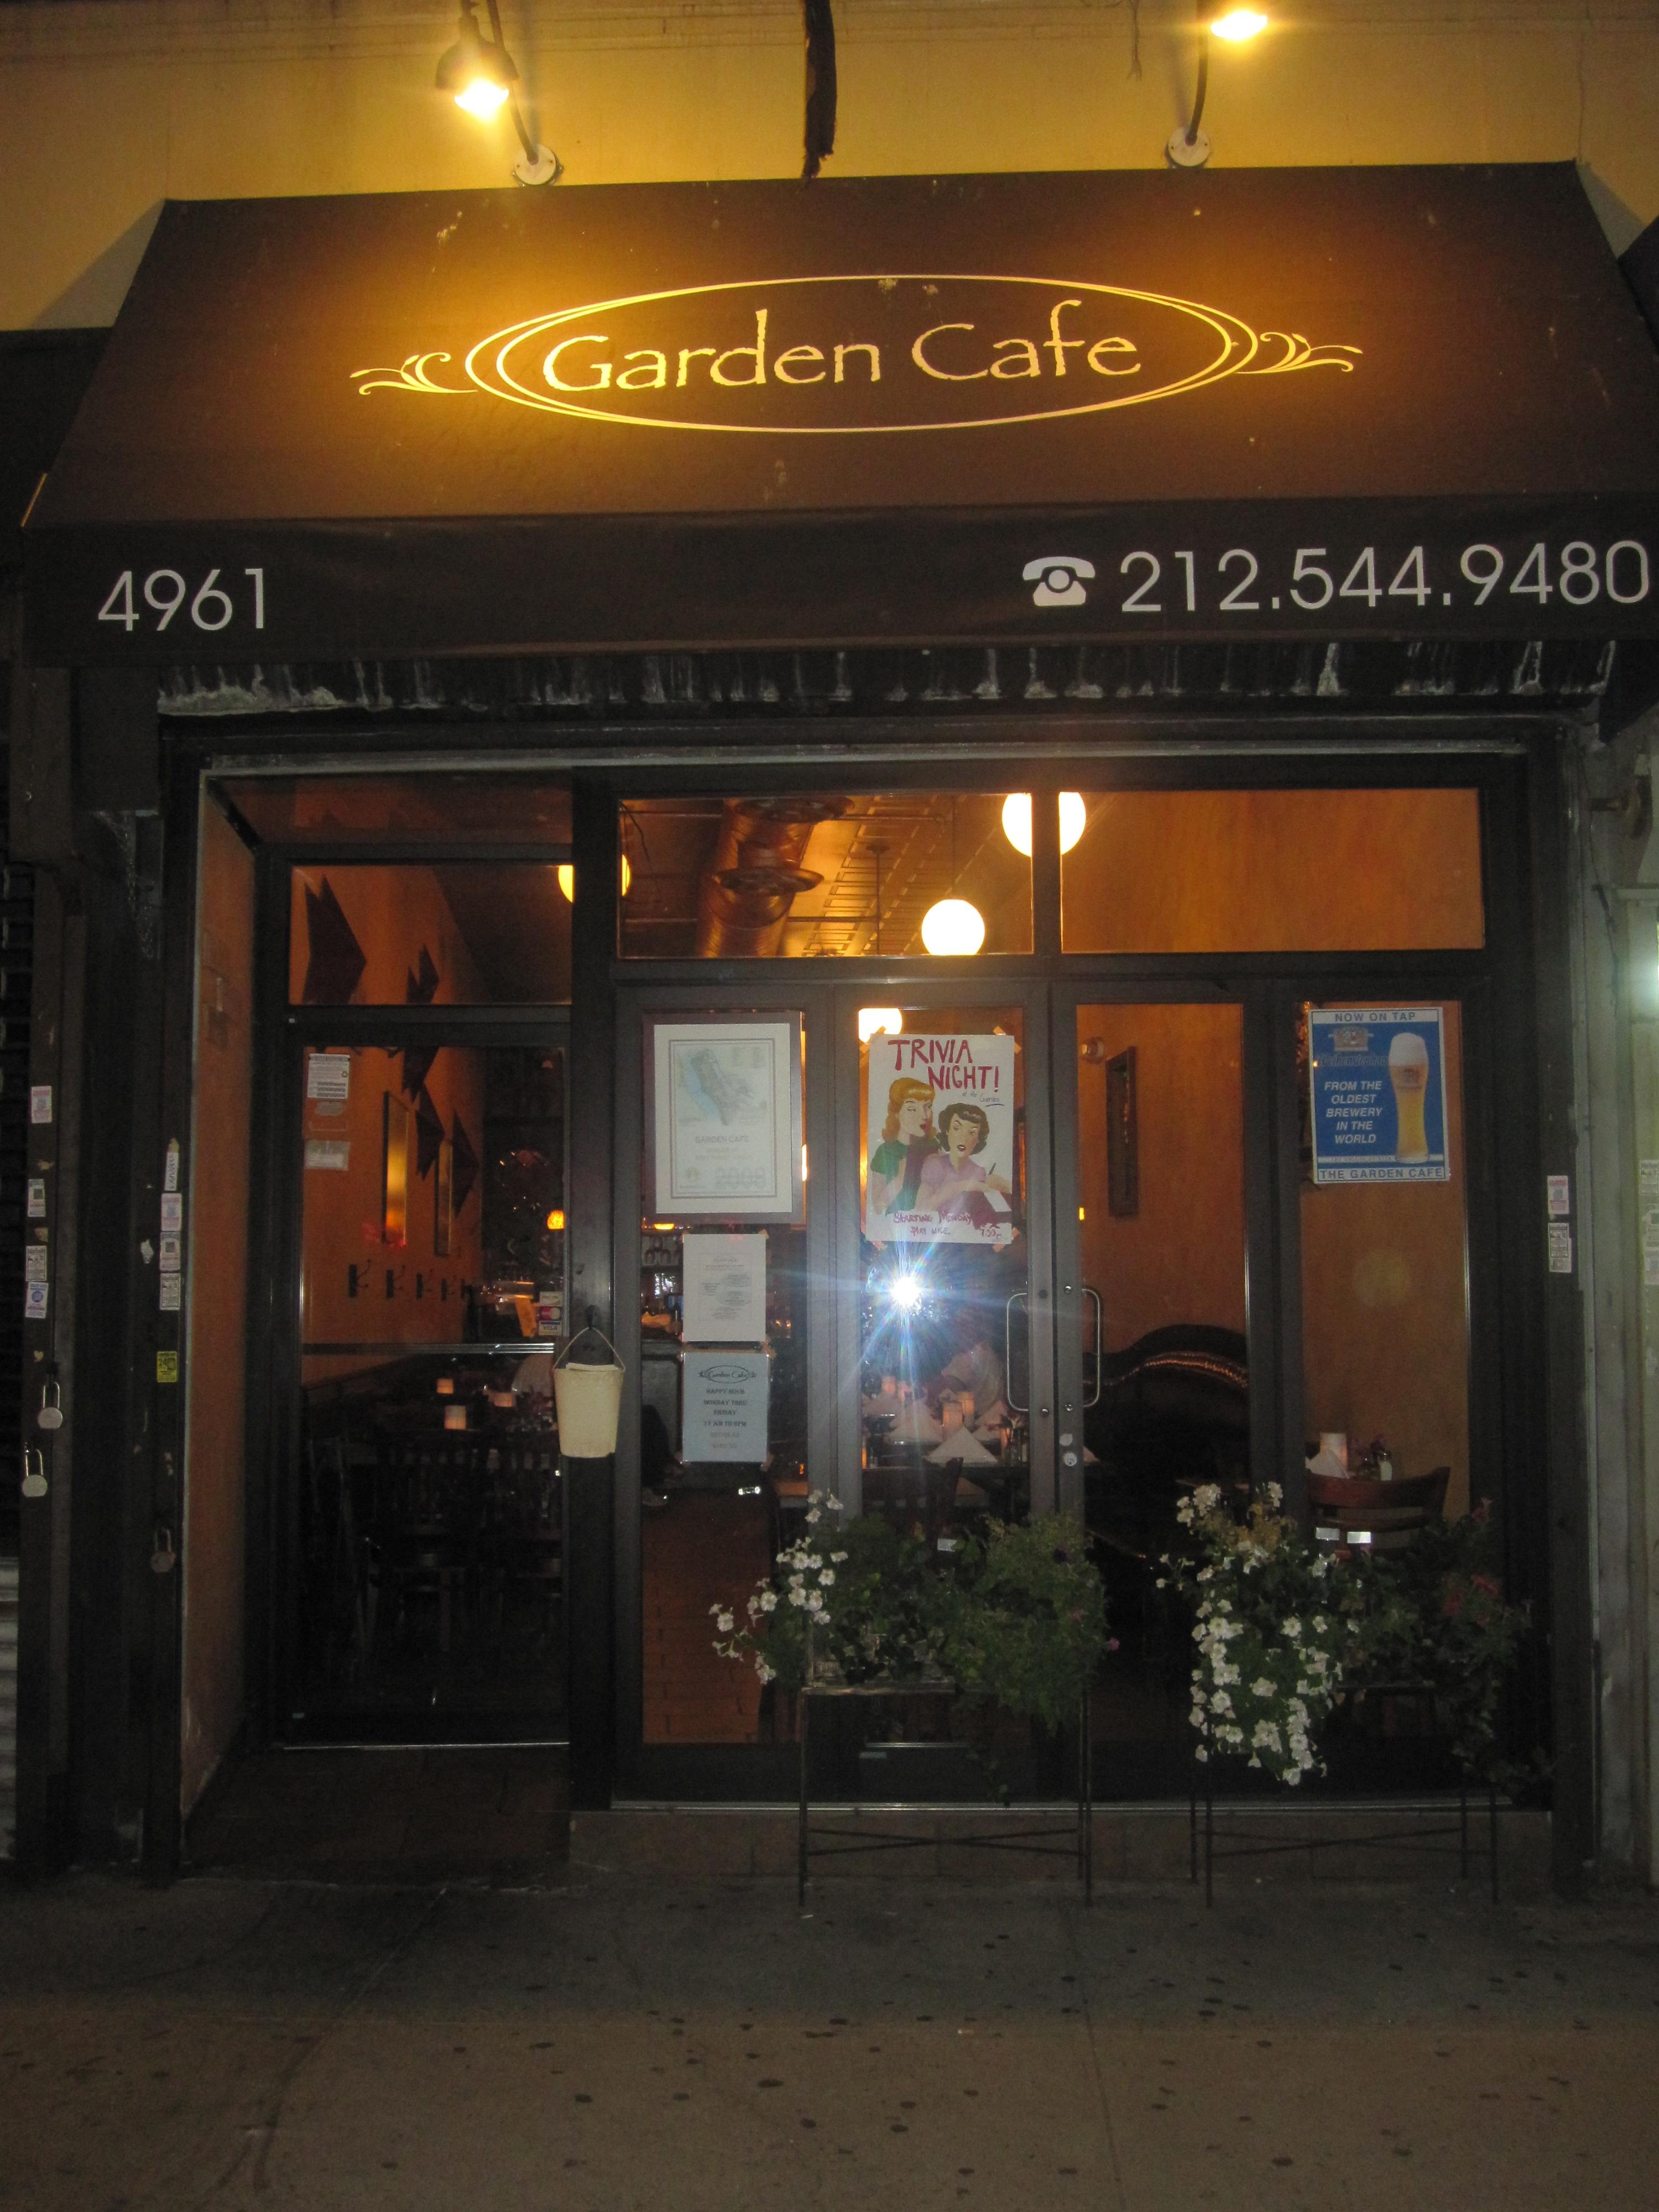 UPTOWN OASIS – THE GARDEN CAFÉ | Washington Heights, Inwood & Harlem ...